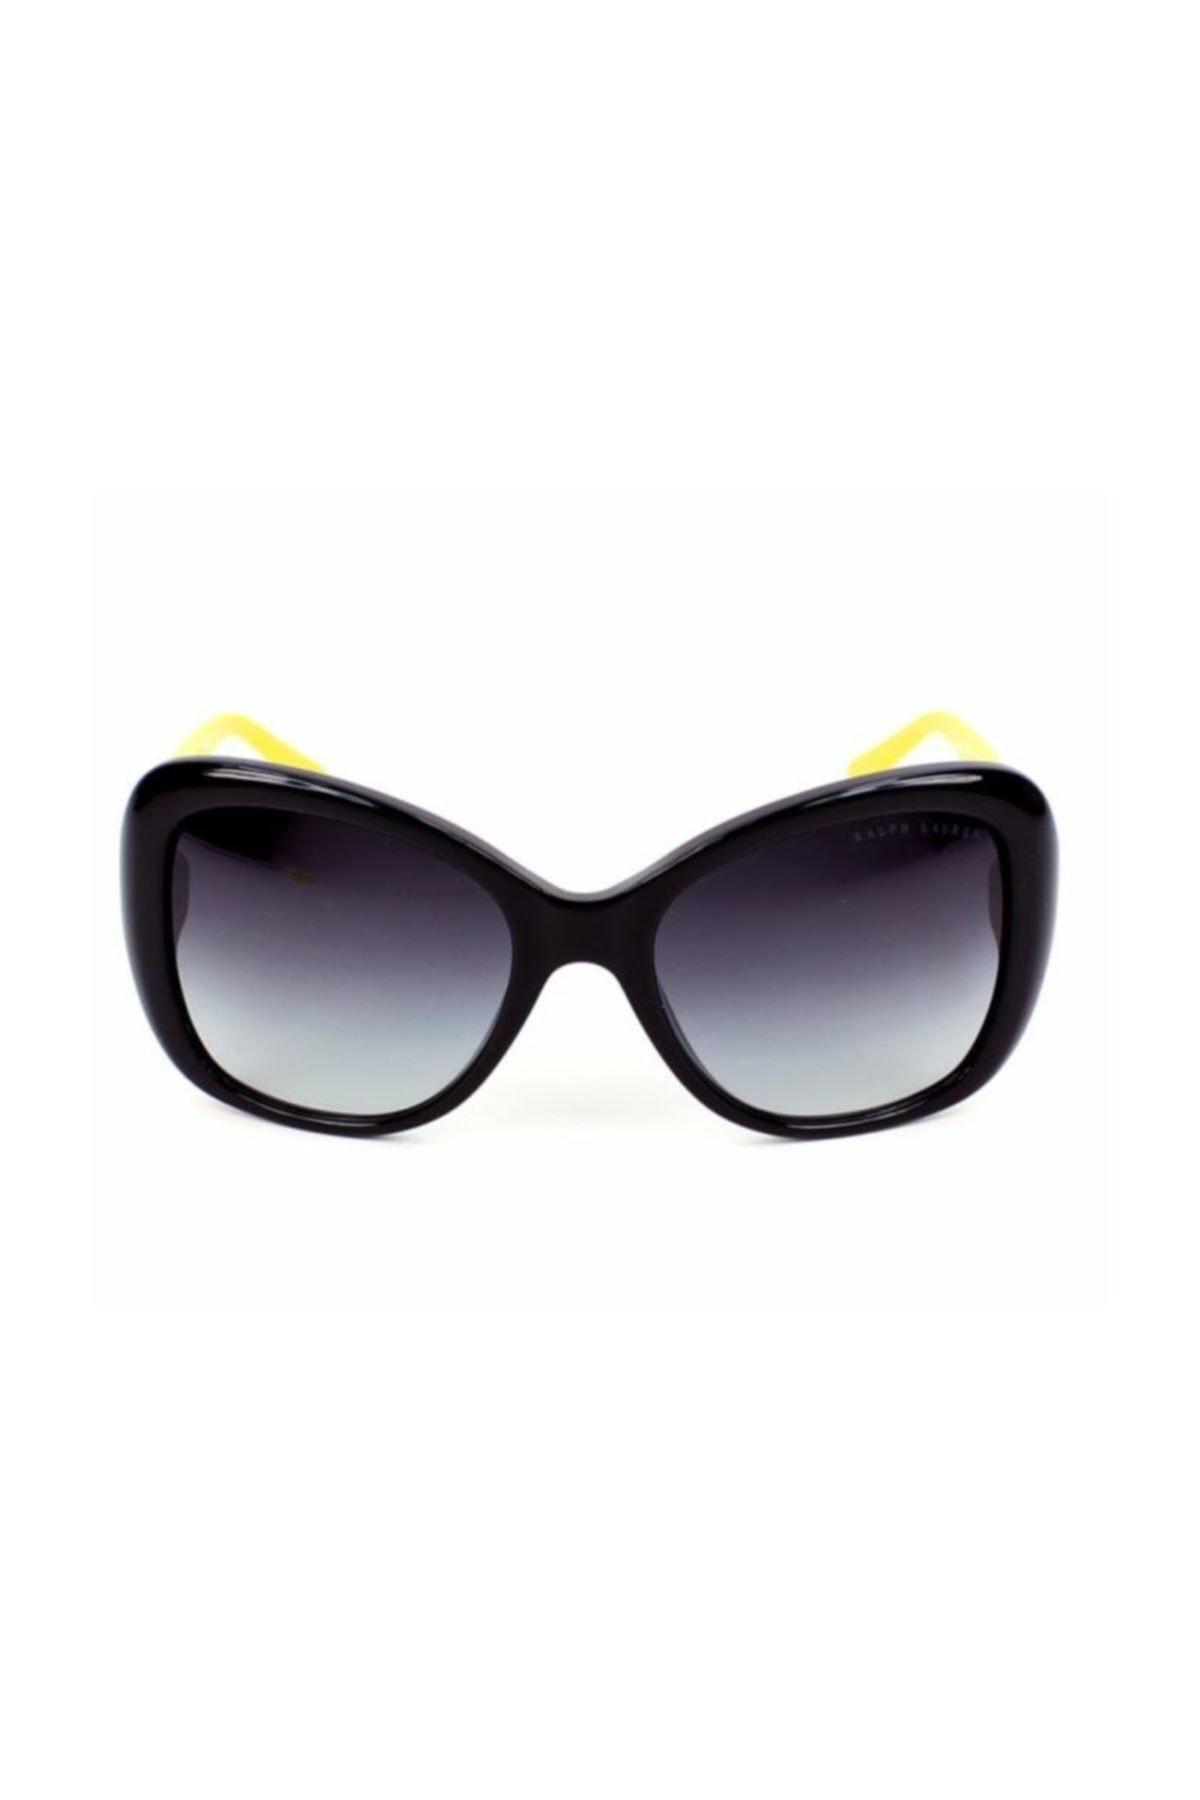 Ralph Lauren Rl 8108-q Col 5001/8g 56-19-135 Bayan Güneş Gözlüğü 1